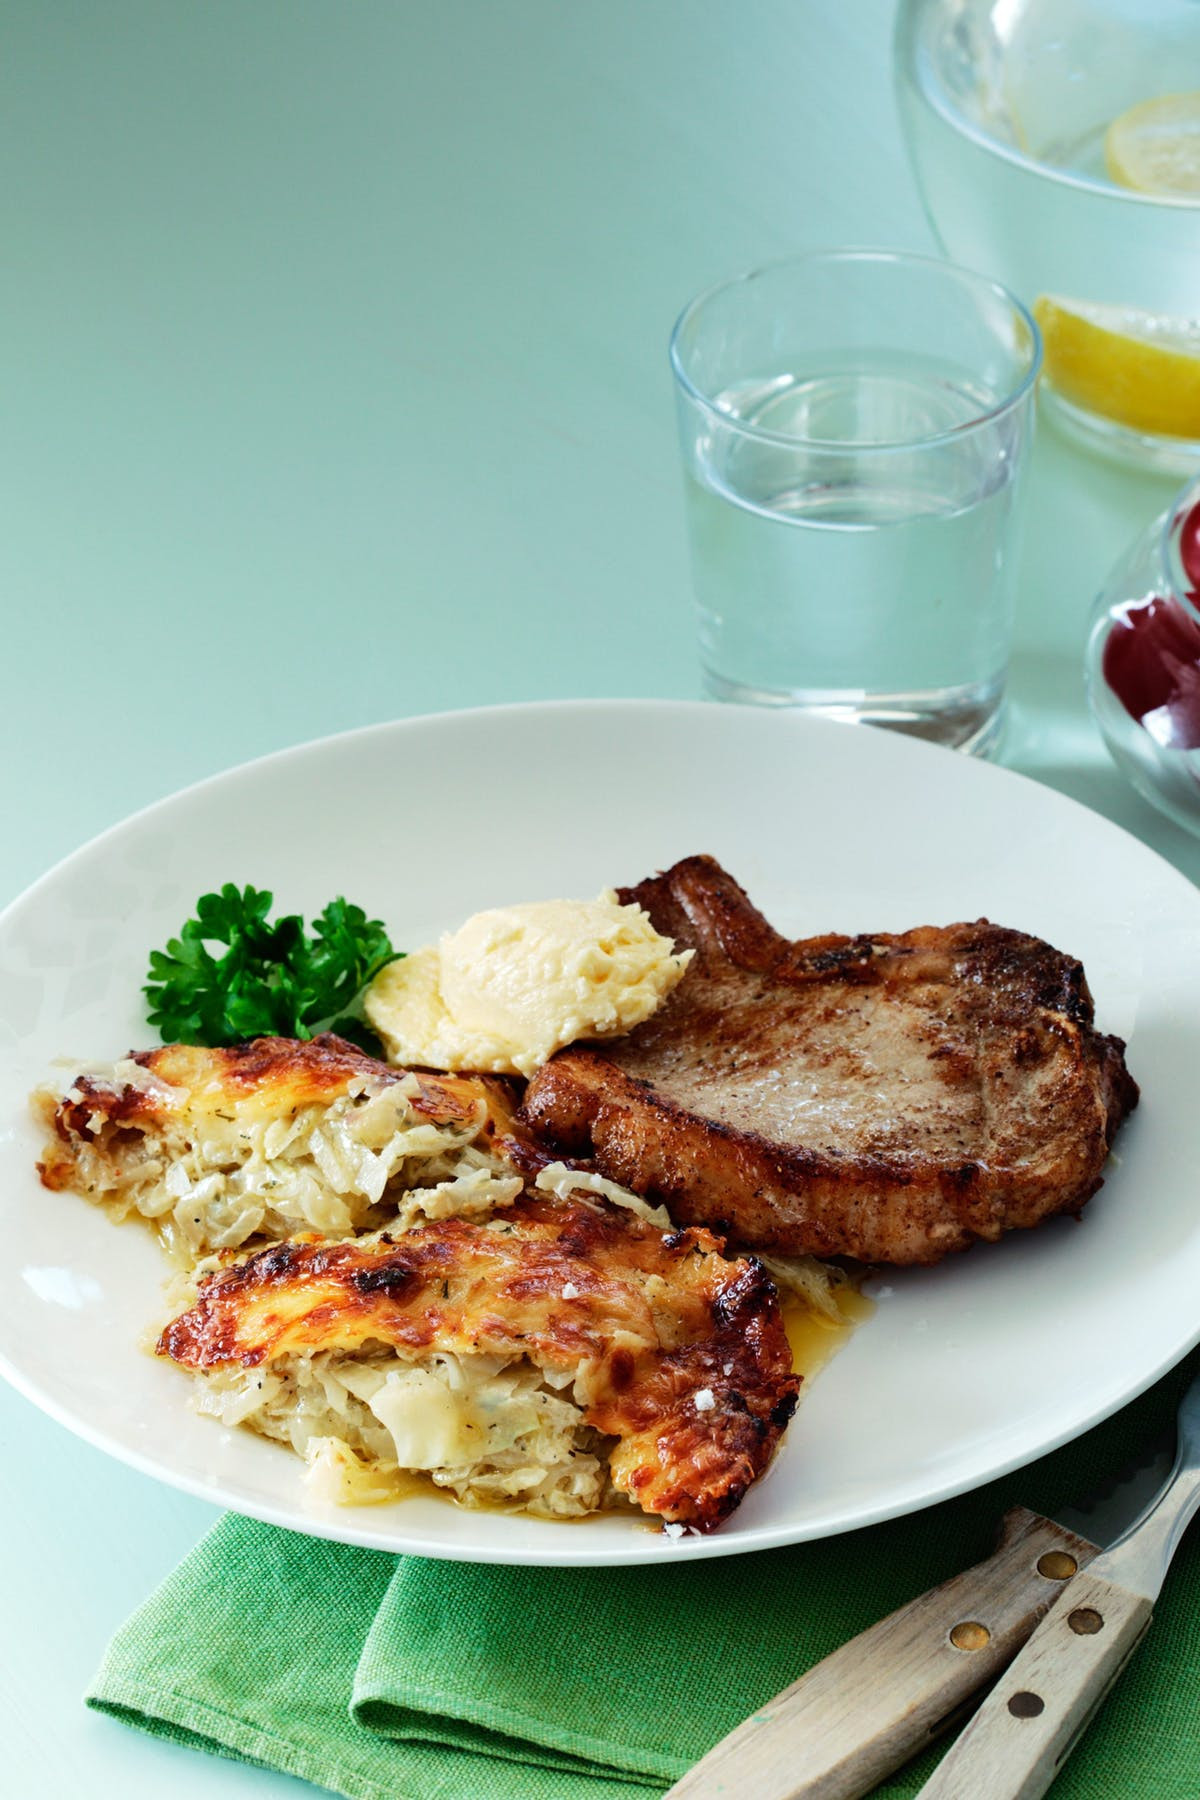 Keto Diet Pork Chops  Keto Pork Chops with Cabbage Casserole & Parmesan Butter